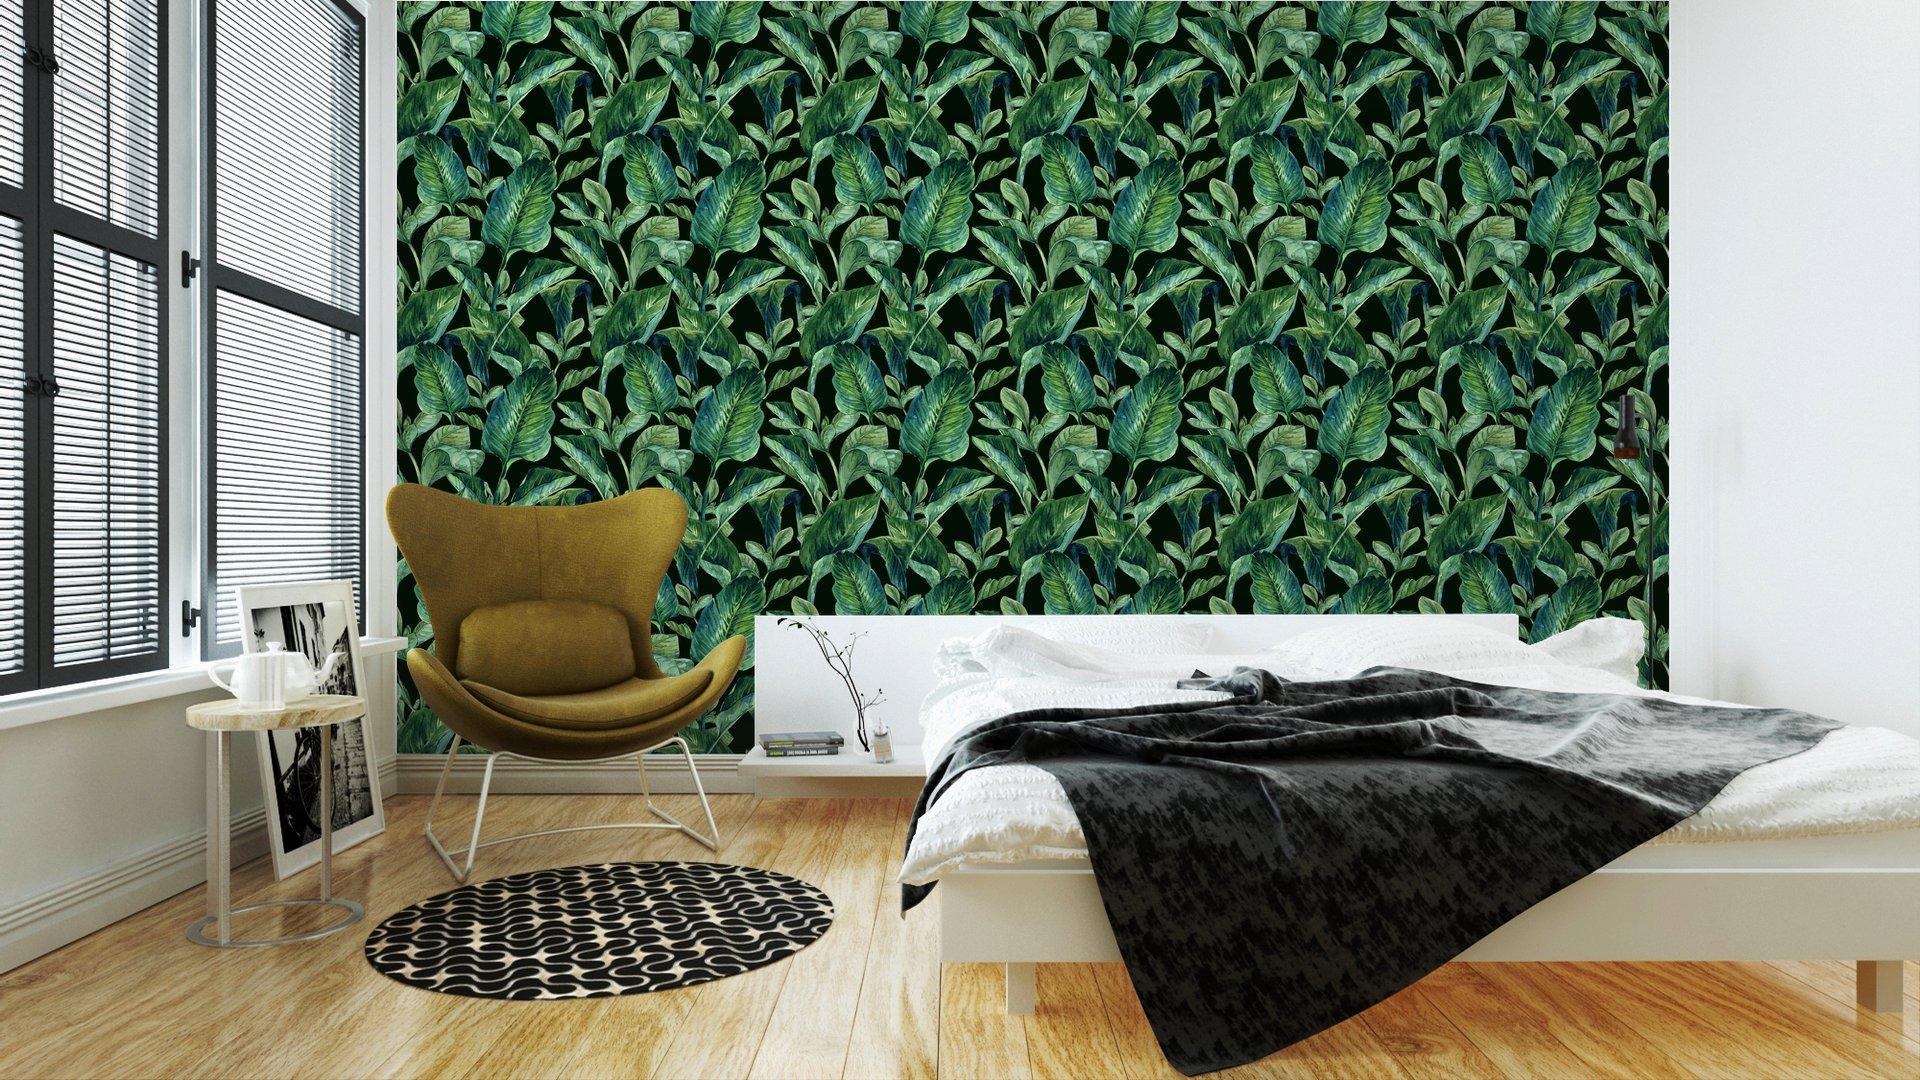 Fotomurales mexico papeles pintados lavables fondo inconsutil de la acuarela con hojas tropicales 2 - Papel Tapiz Hojas Tropicales en Fondo Negro 01